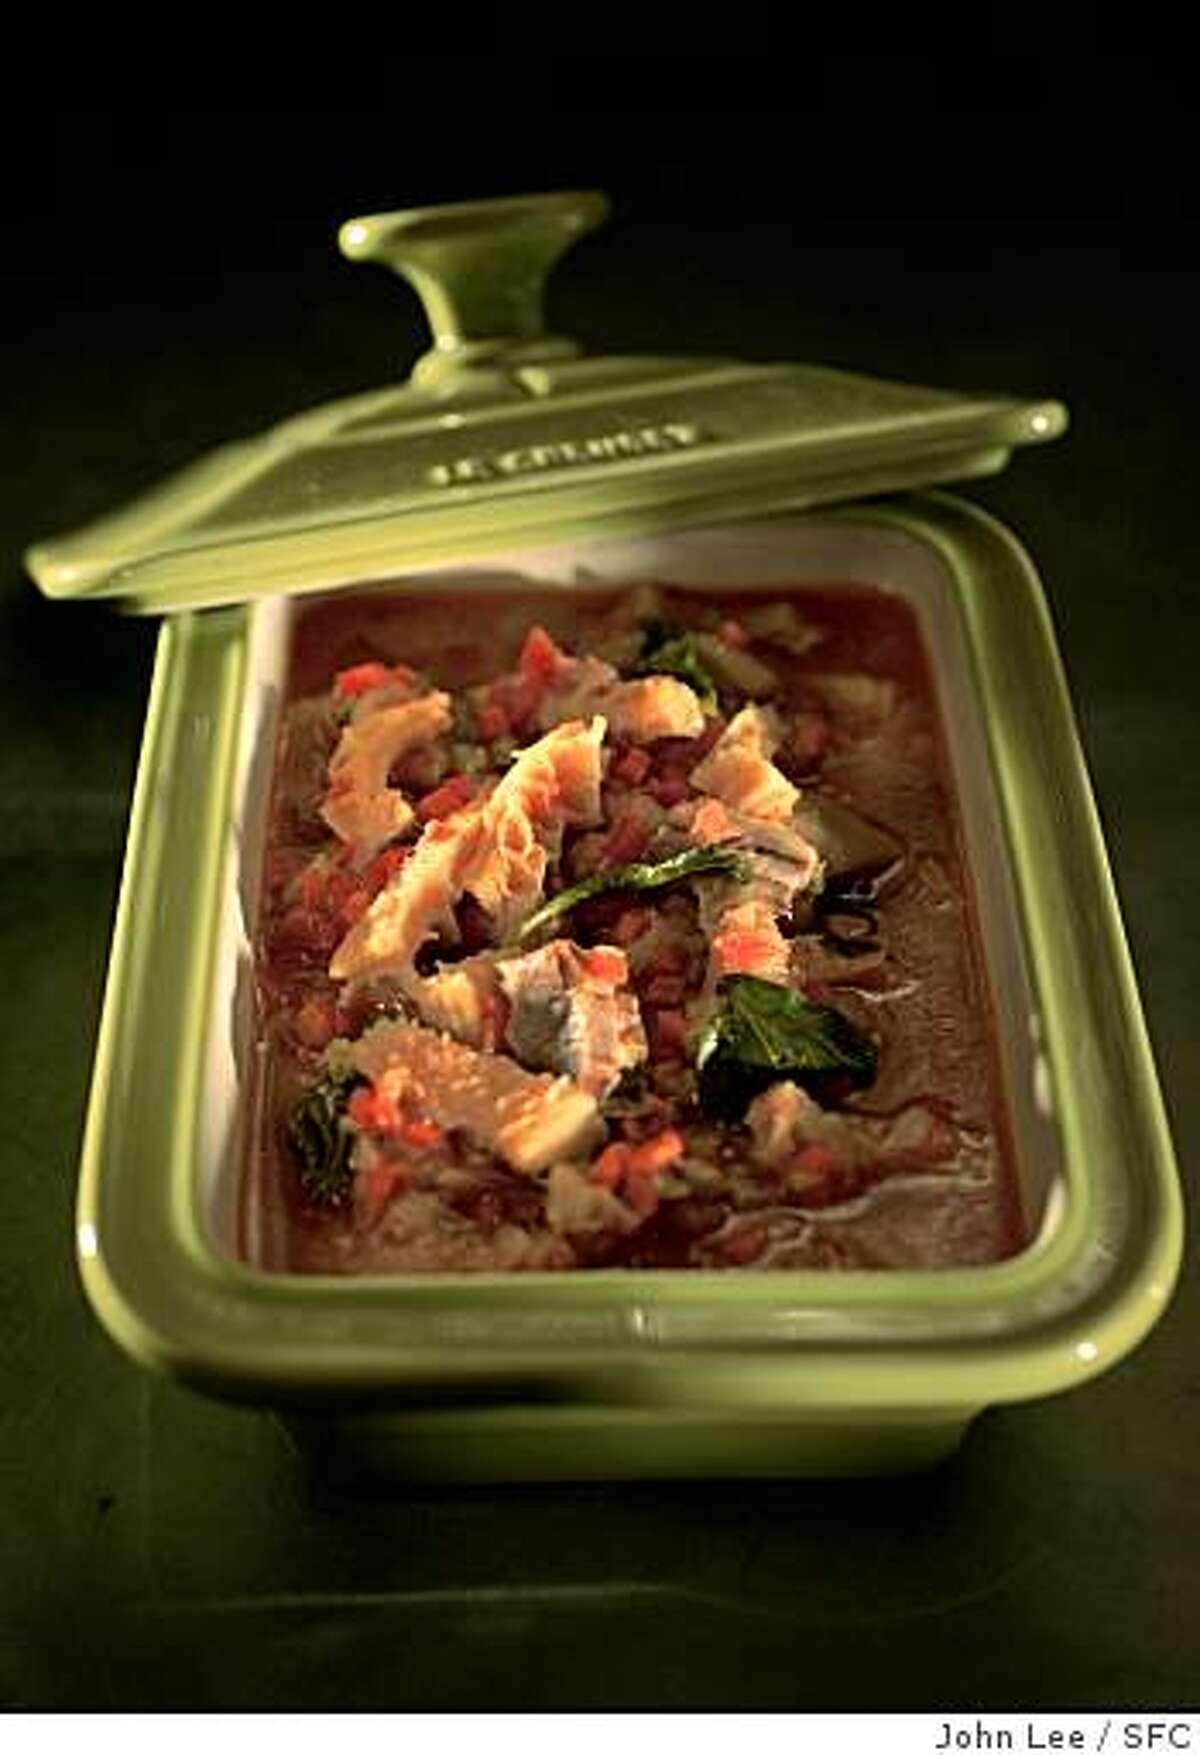 TRIPE12_03_JOHNLEE.JPG Italian tripe stew.By JOHN LEE/SPECIAL TO THE CHRONICLE